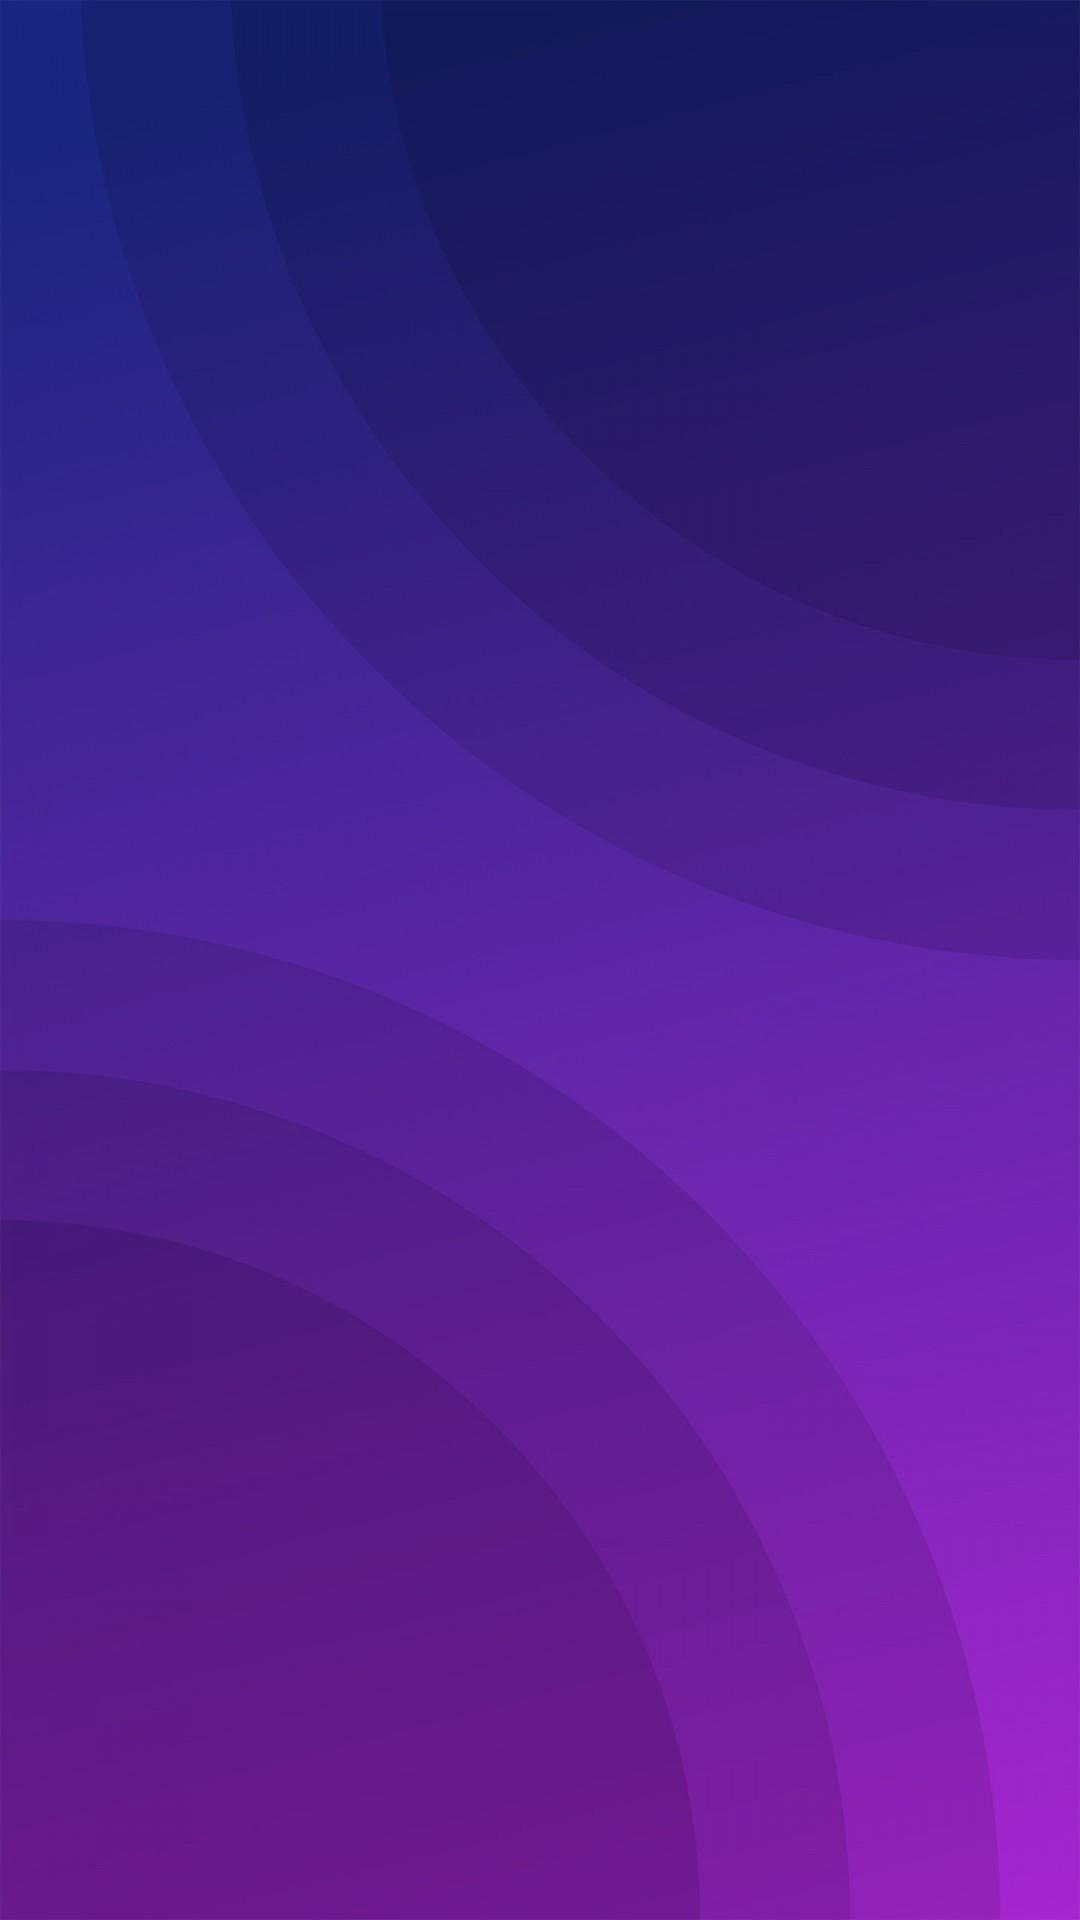 Free Purple Ambient phone wallpaper by lilmama317